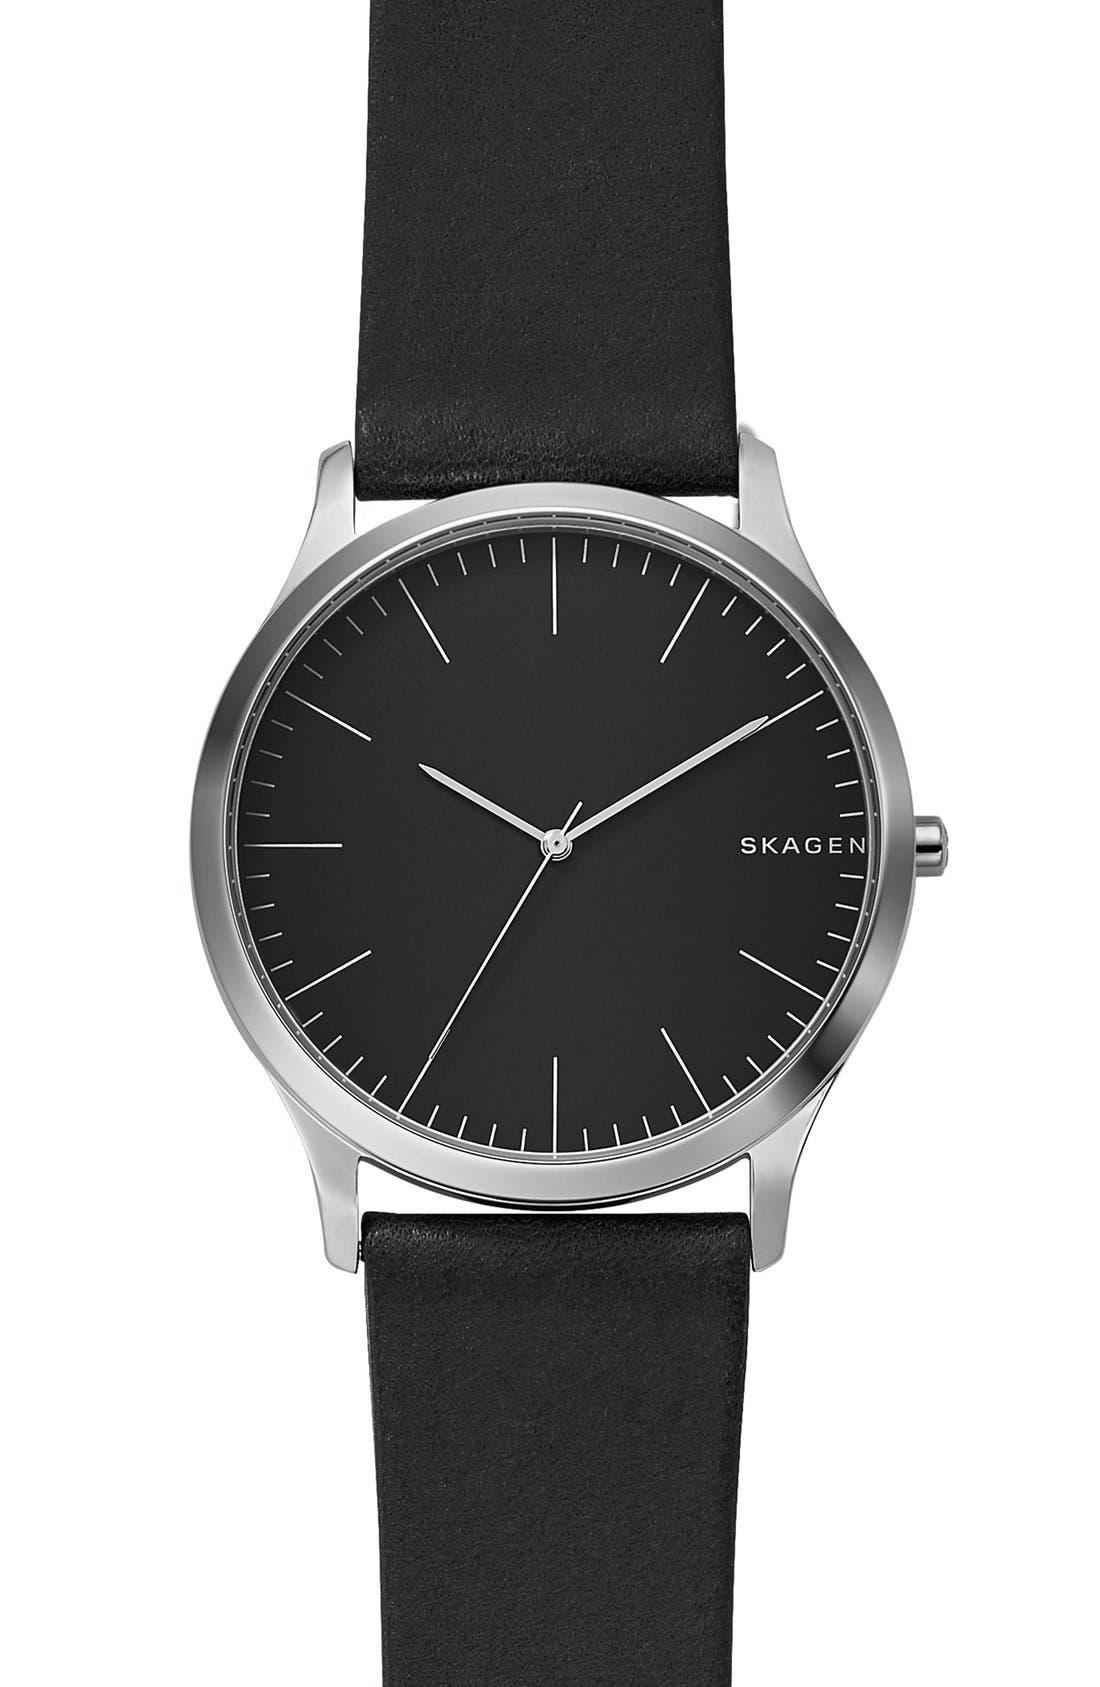 Main Image - Skagen Jorn Leather Strap Watch, 41mm